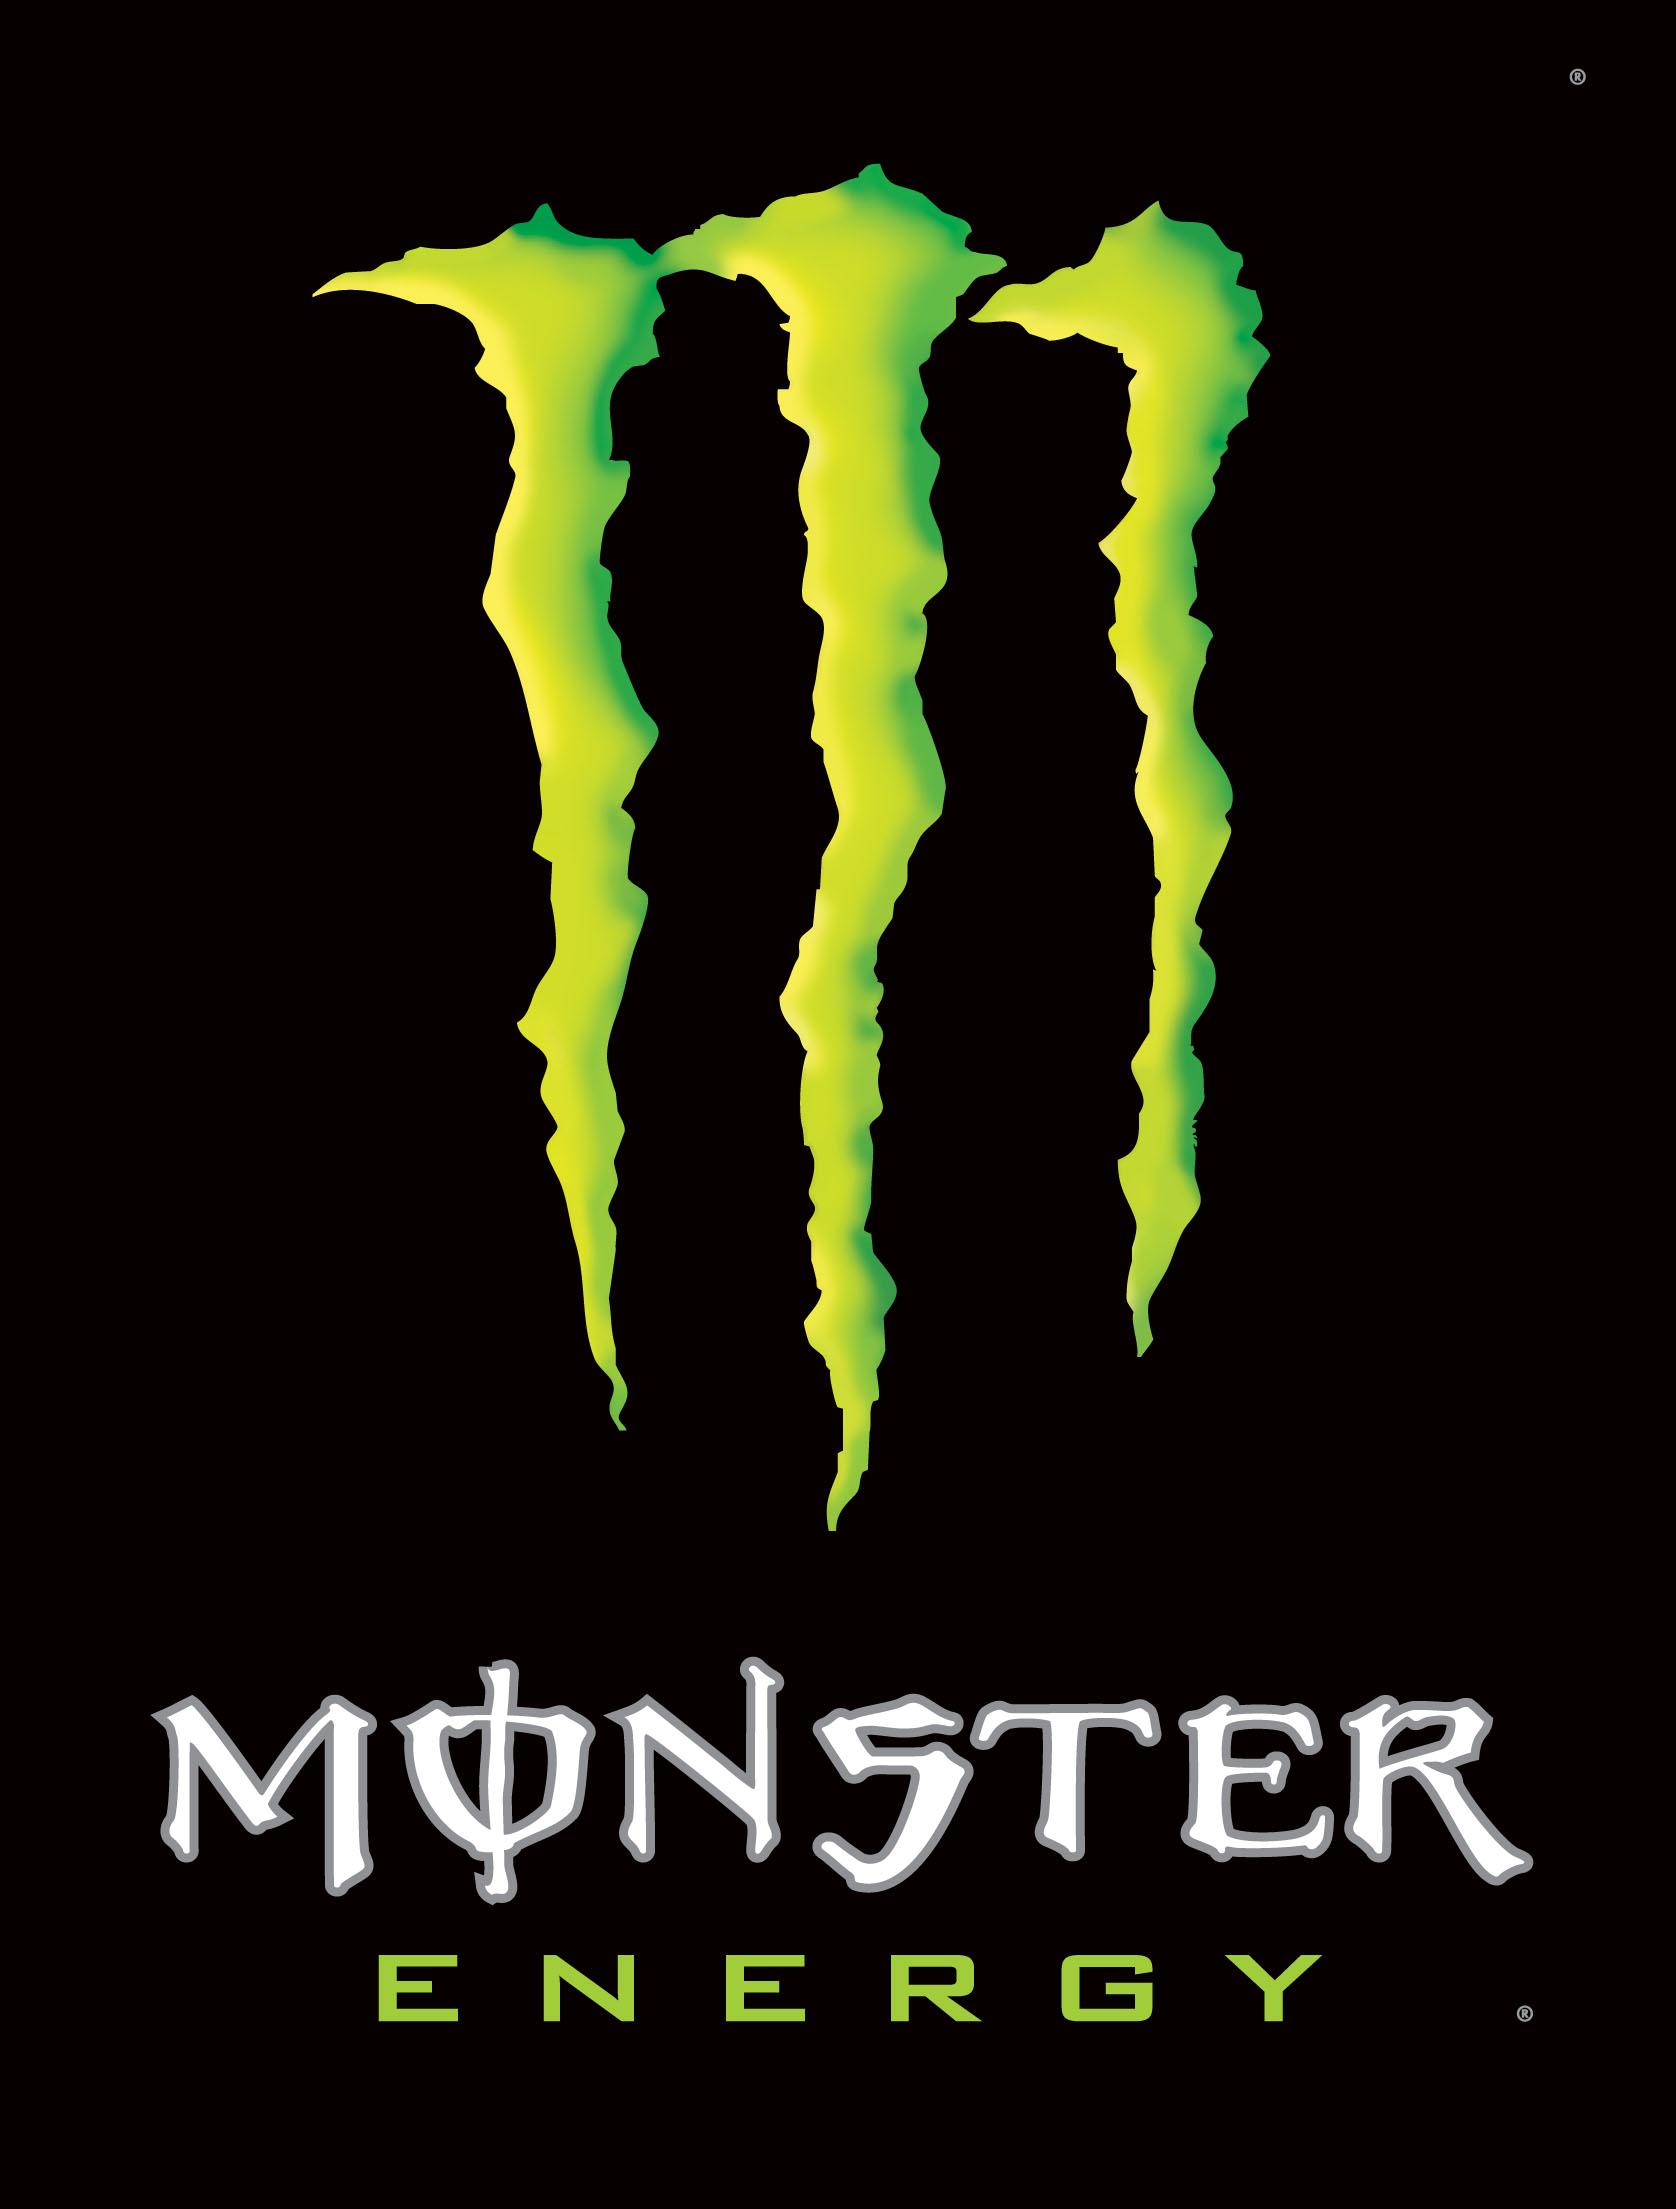 MonoStar Logo photo - 1